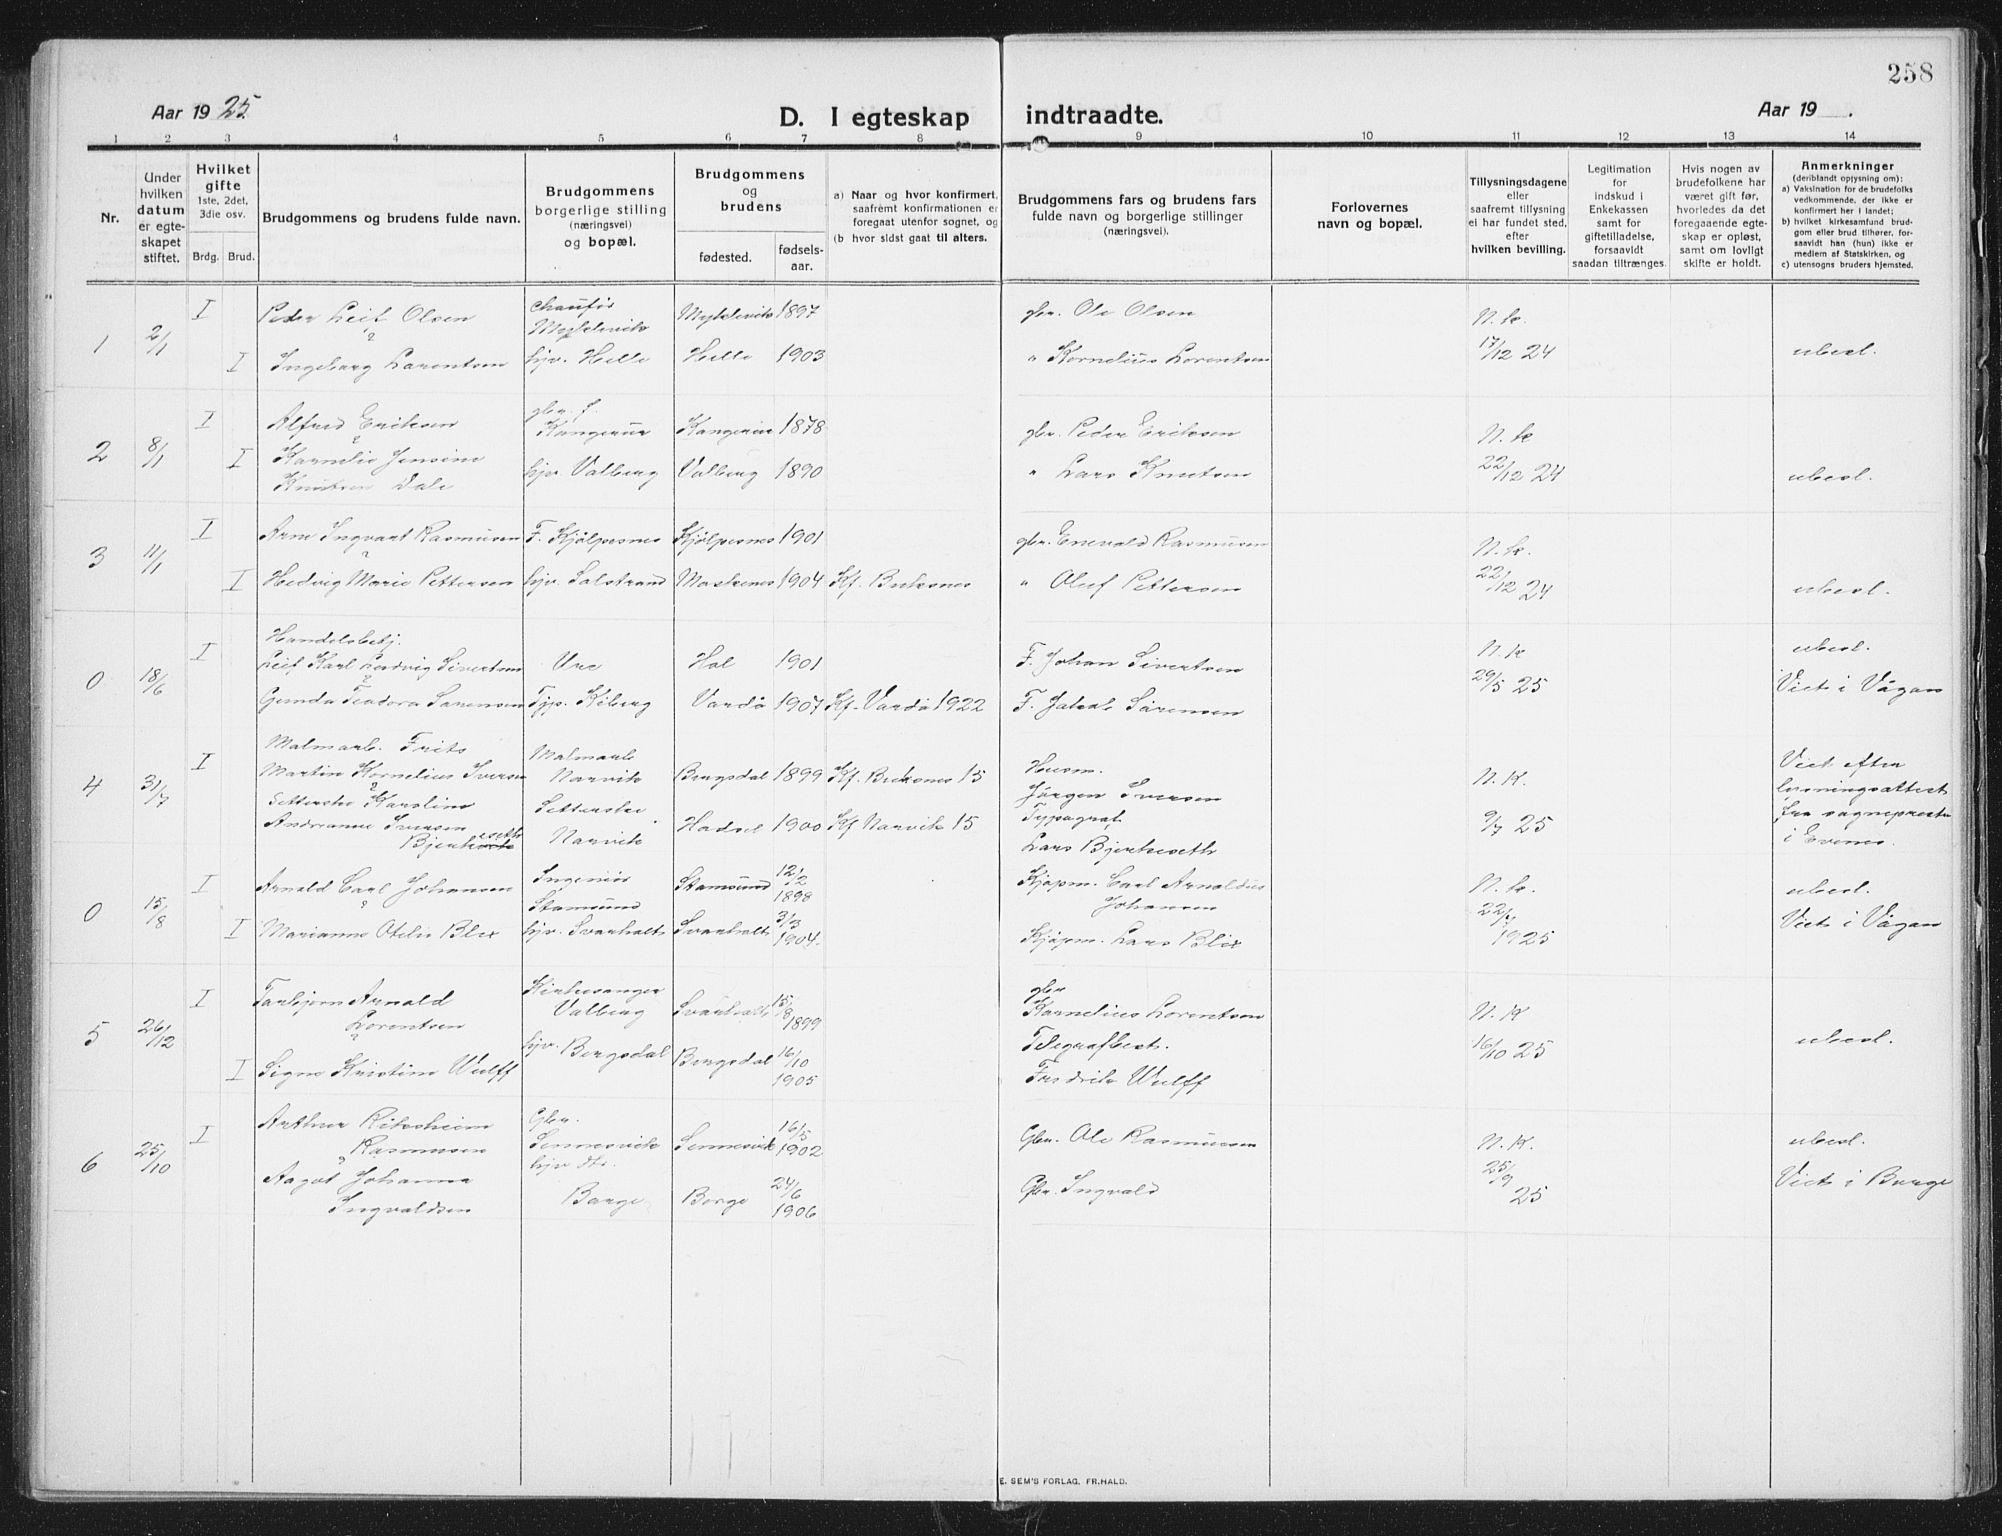 SAT, Ministerialprotokoller, klokkerbøker og fødselsregistre - Nordland, 882/L1183: Klokkerbok nr. 882C01, 1911-1938, s. 258